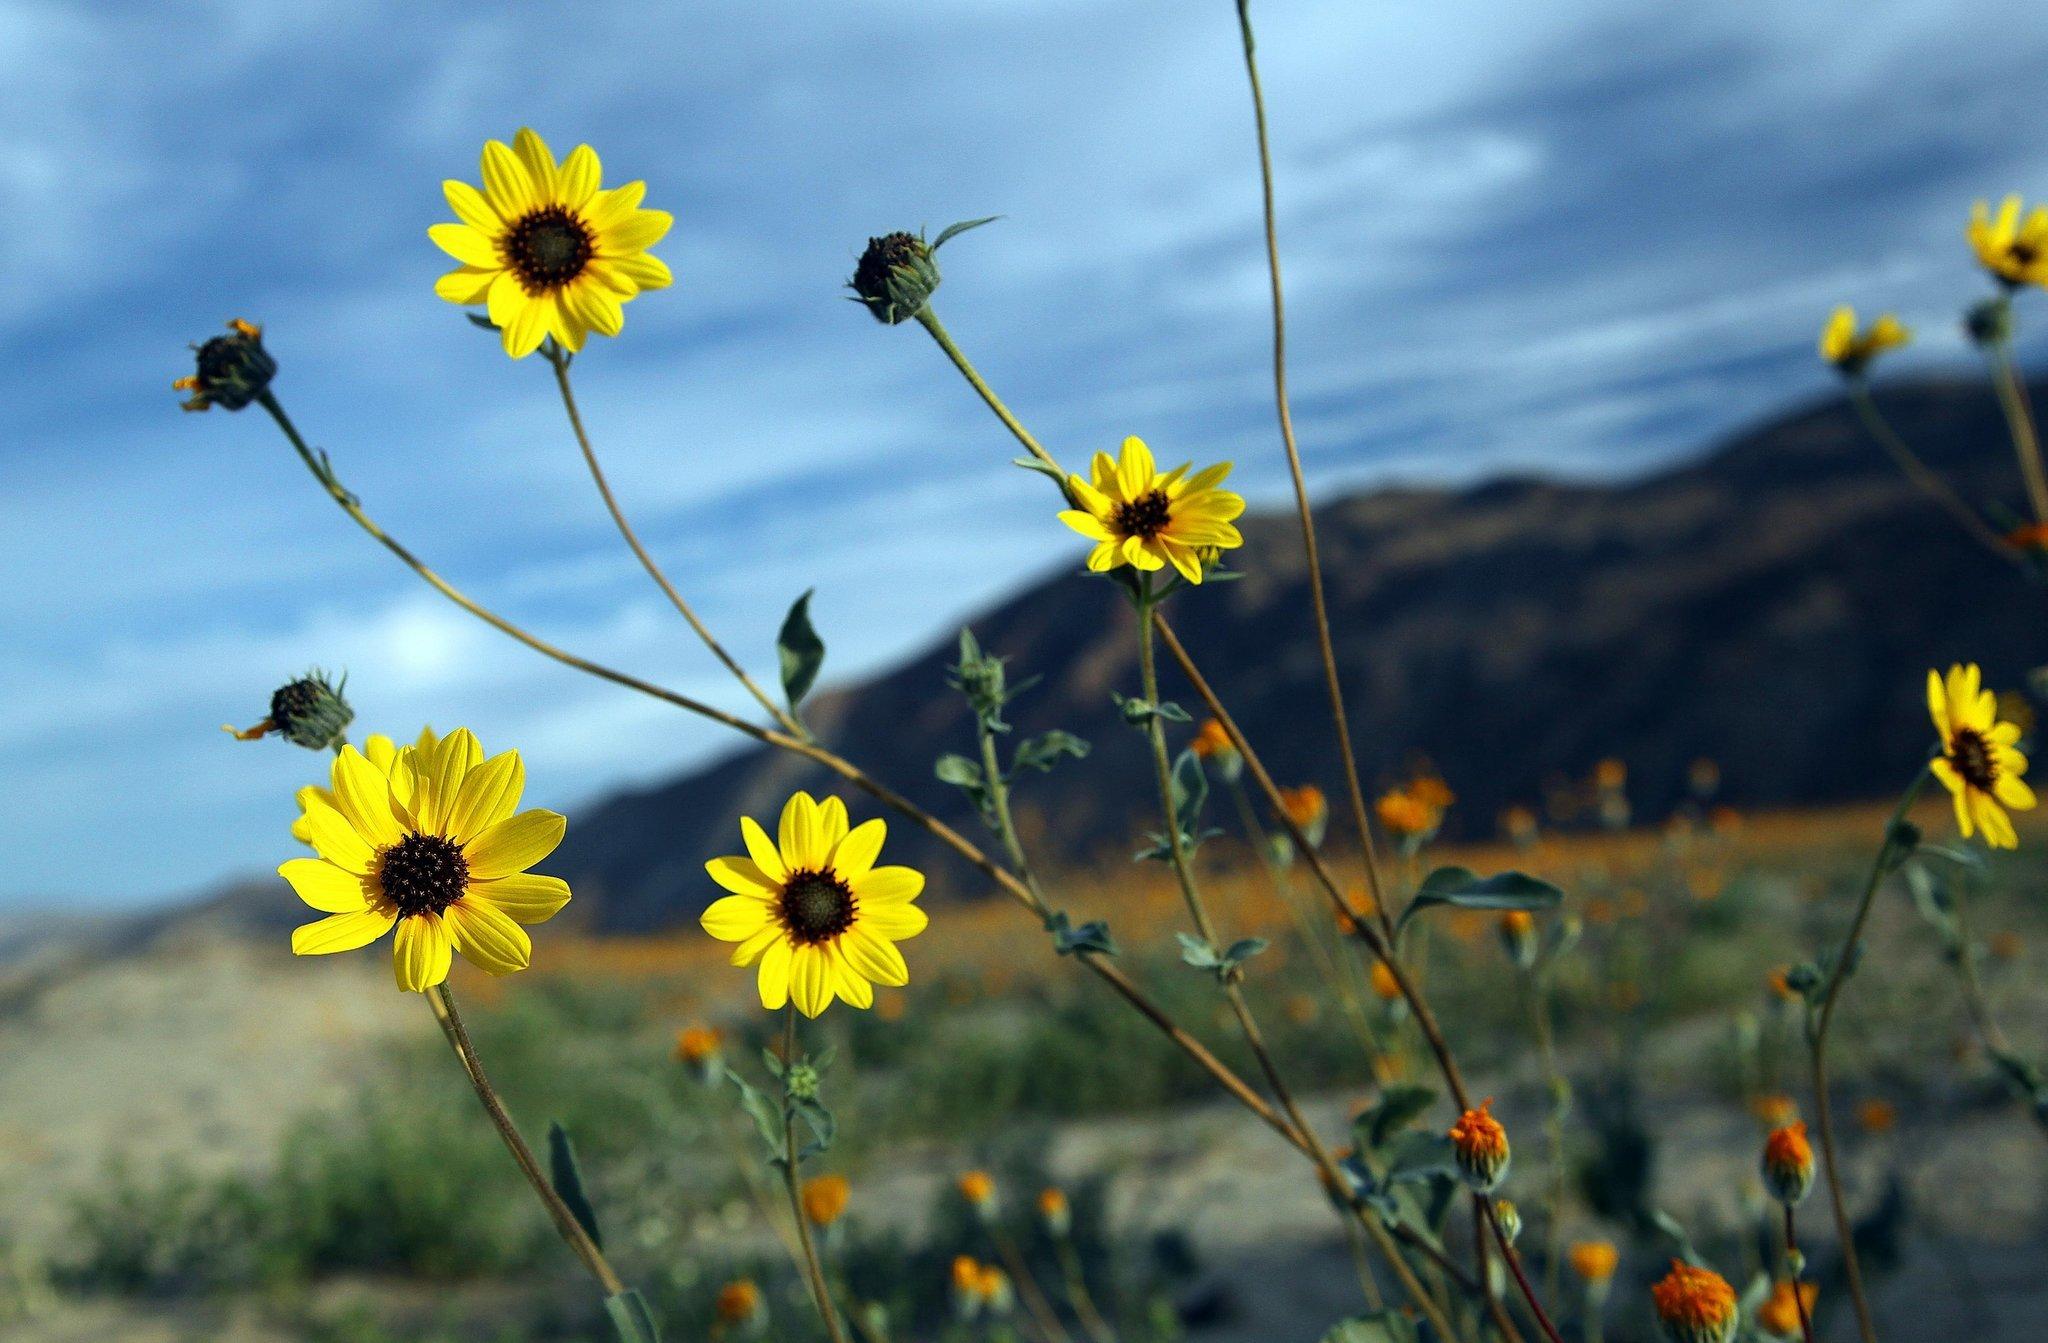 Anza Borrego Henderson Canyon Wildflowers Bloom In Borrego The San Diego Union Tribune